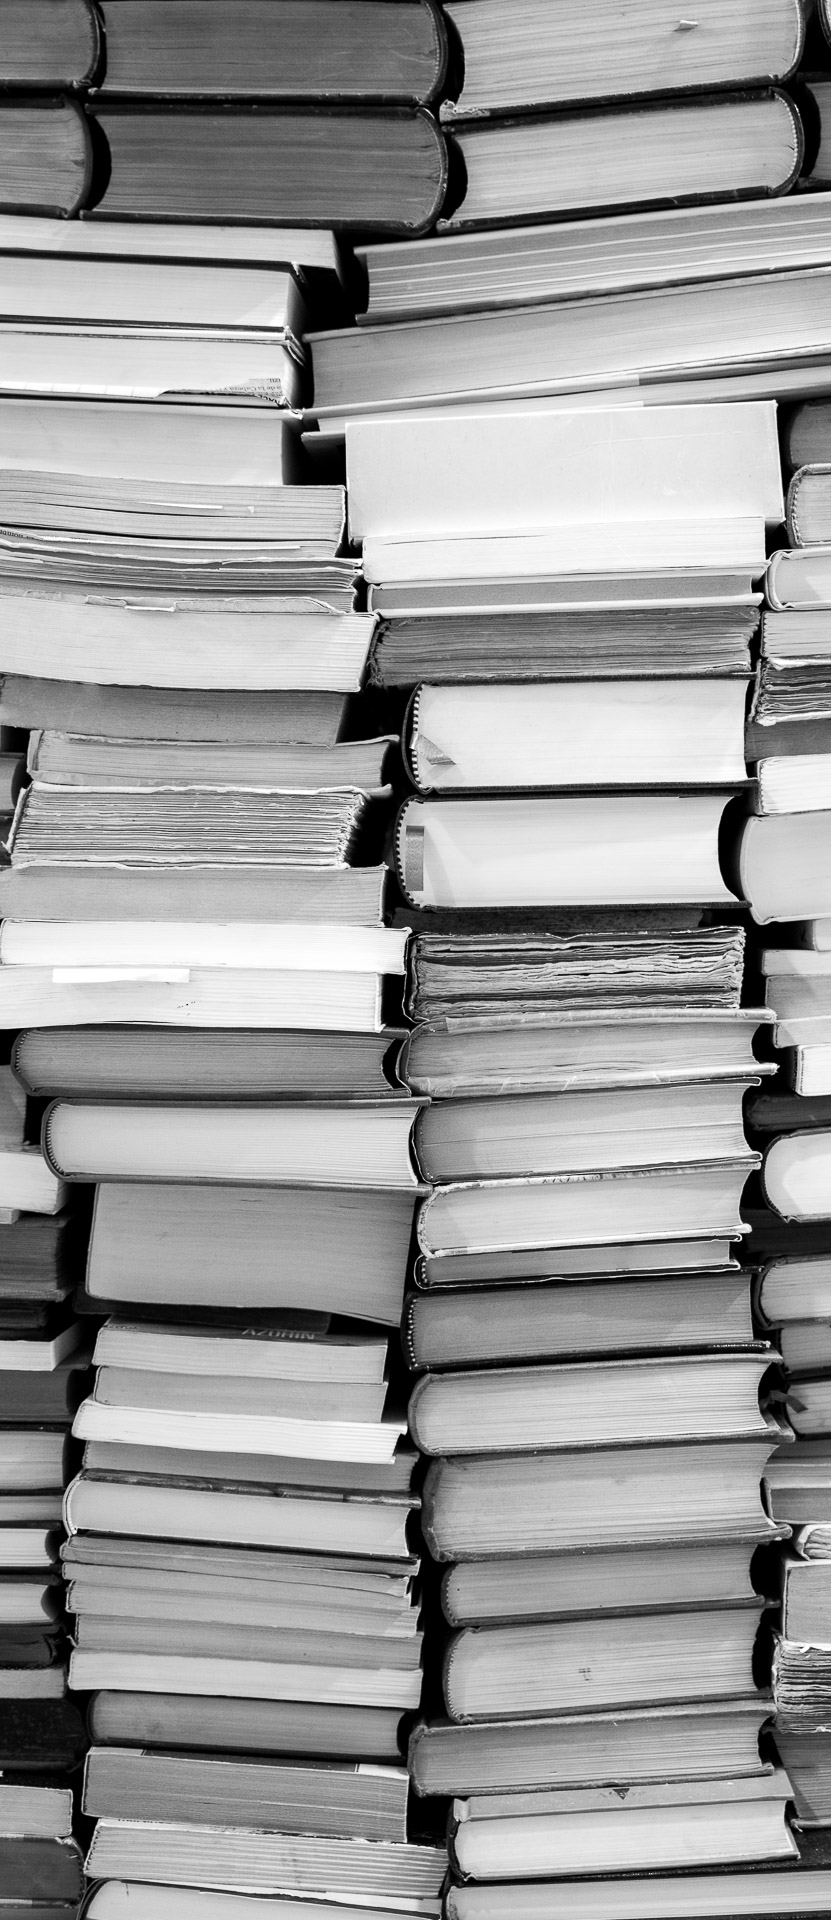 librerias-madrid-abaco04slim.jpg